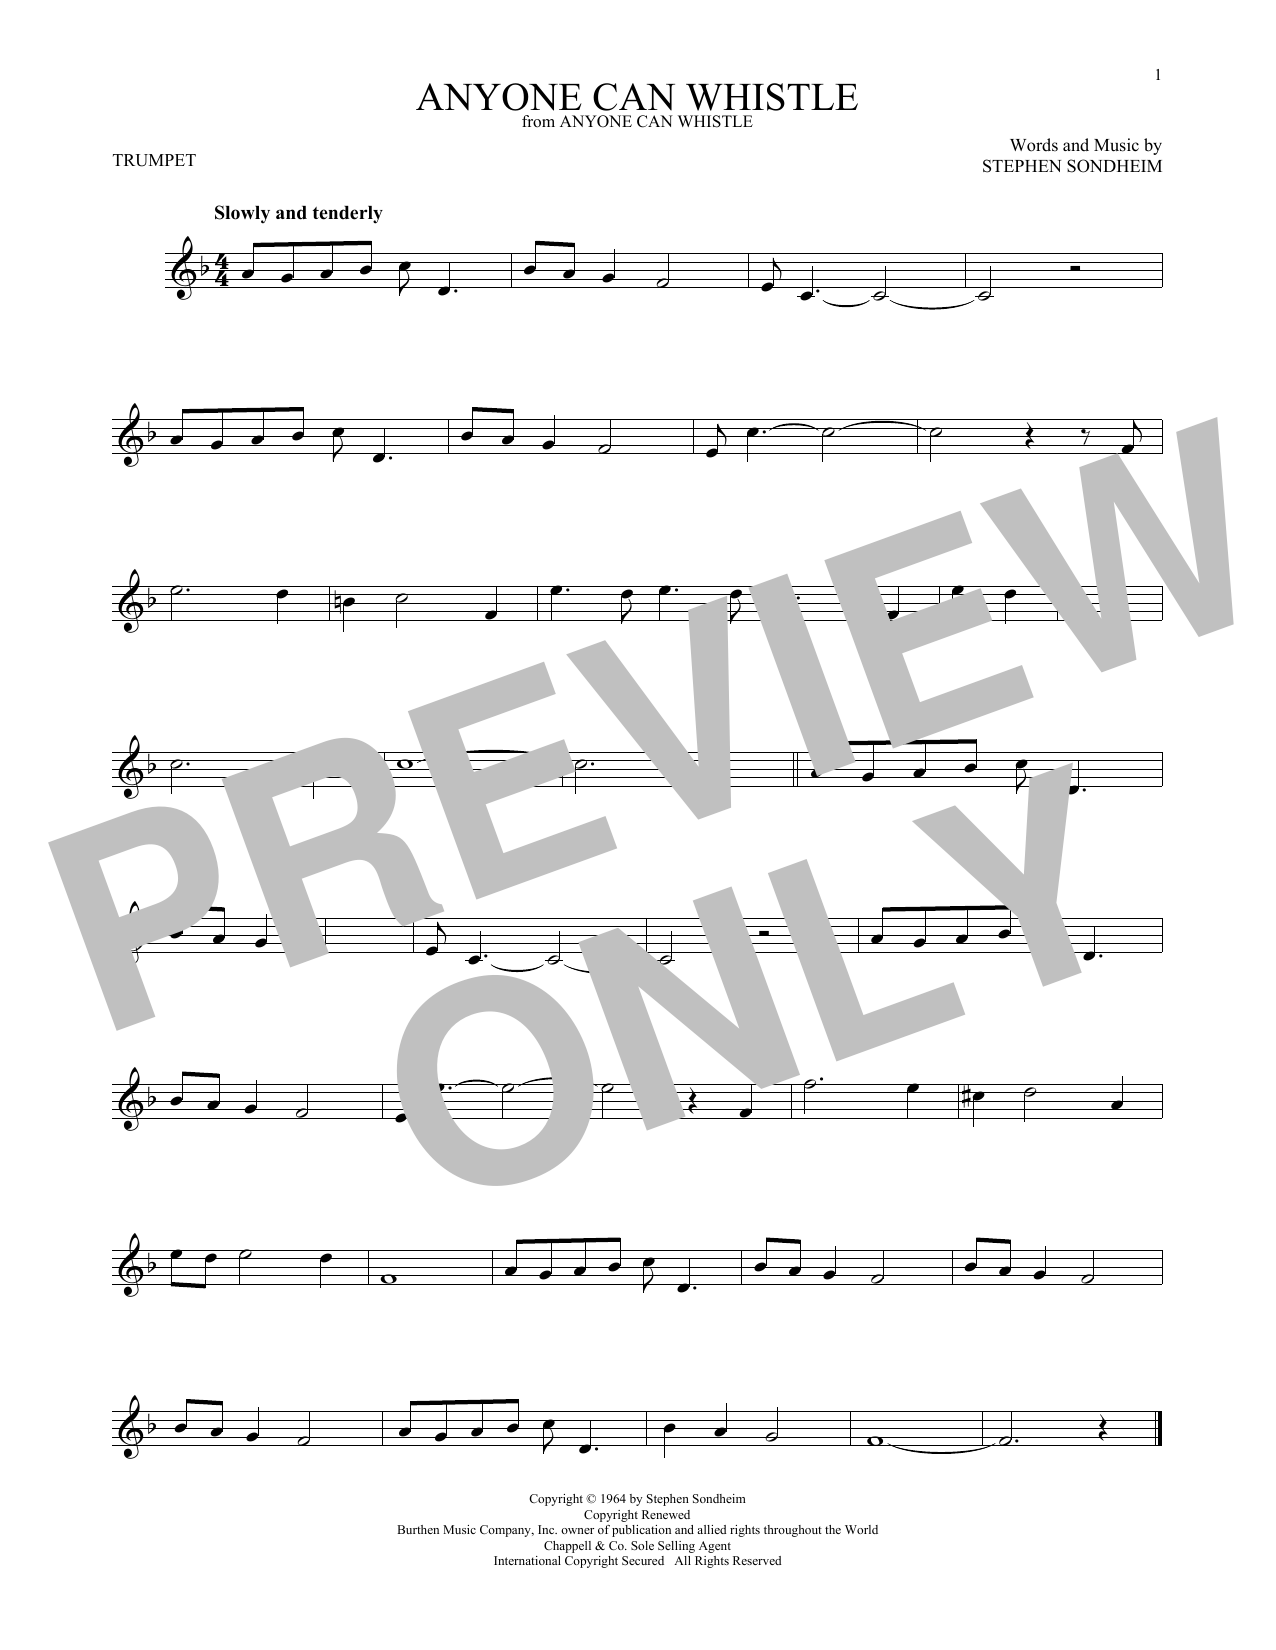 Stephen Sondheim - Anyone Can Whistle